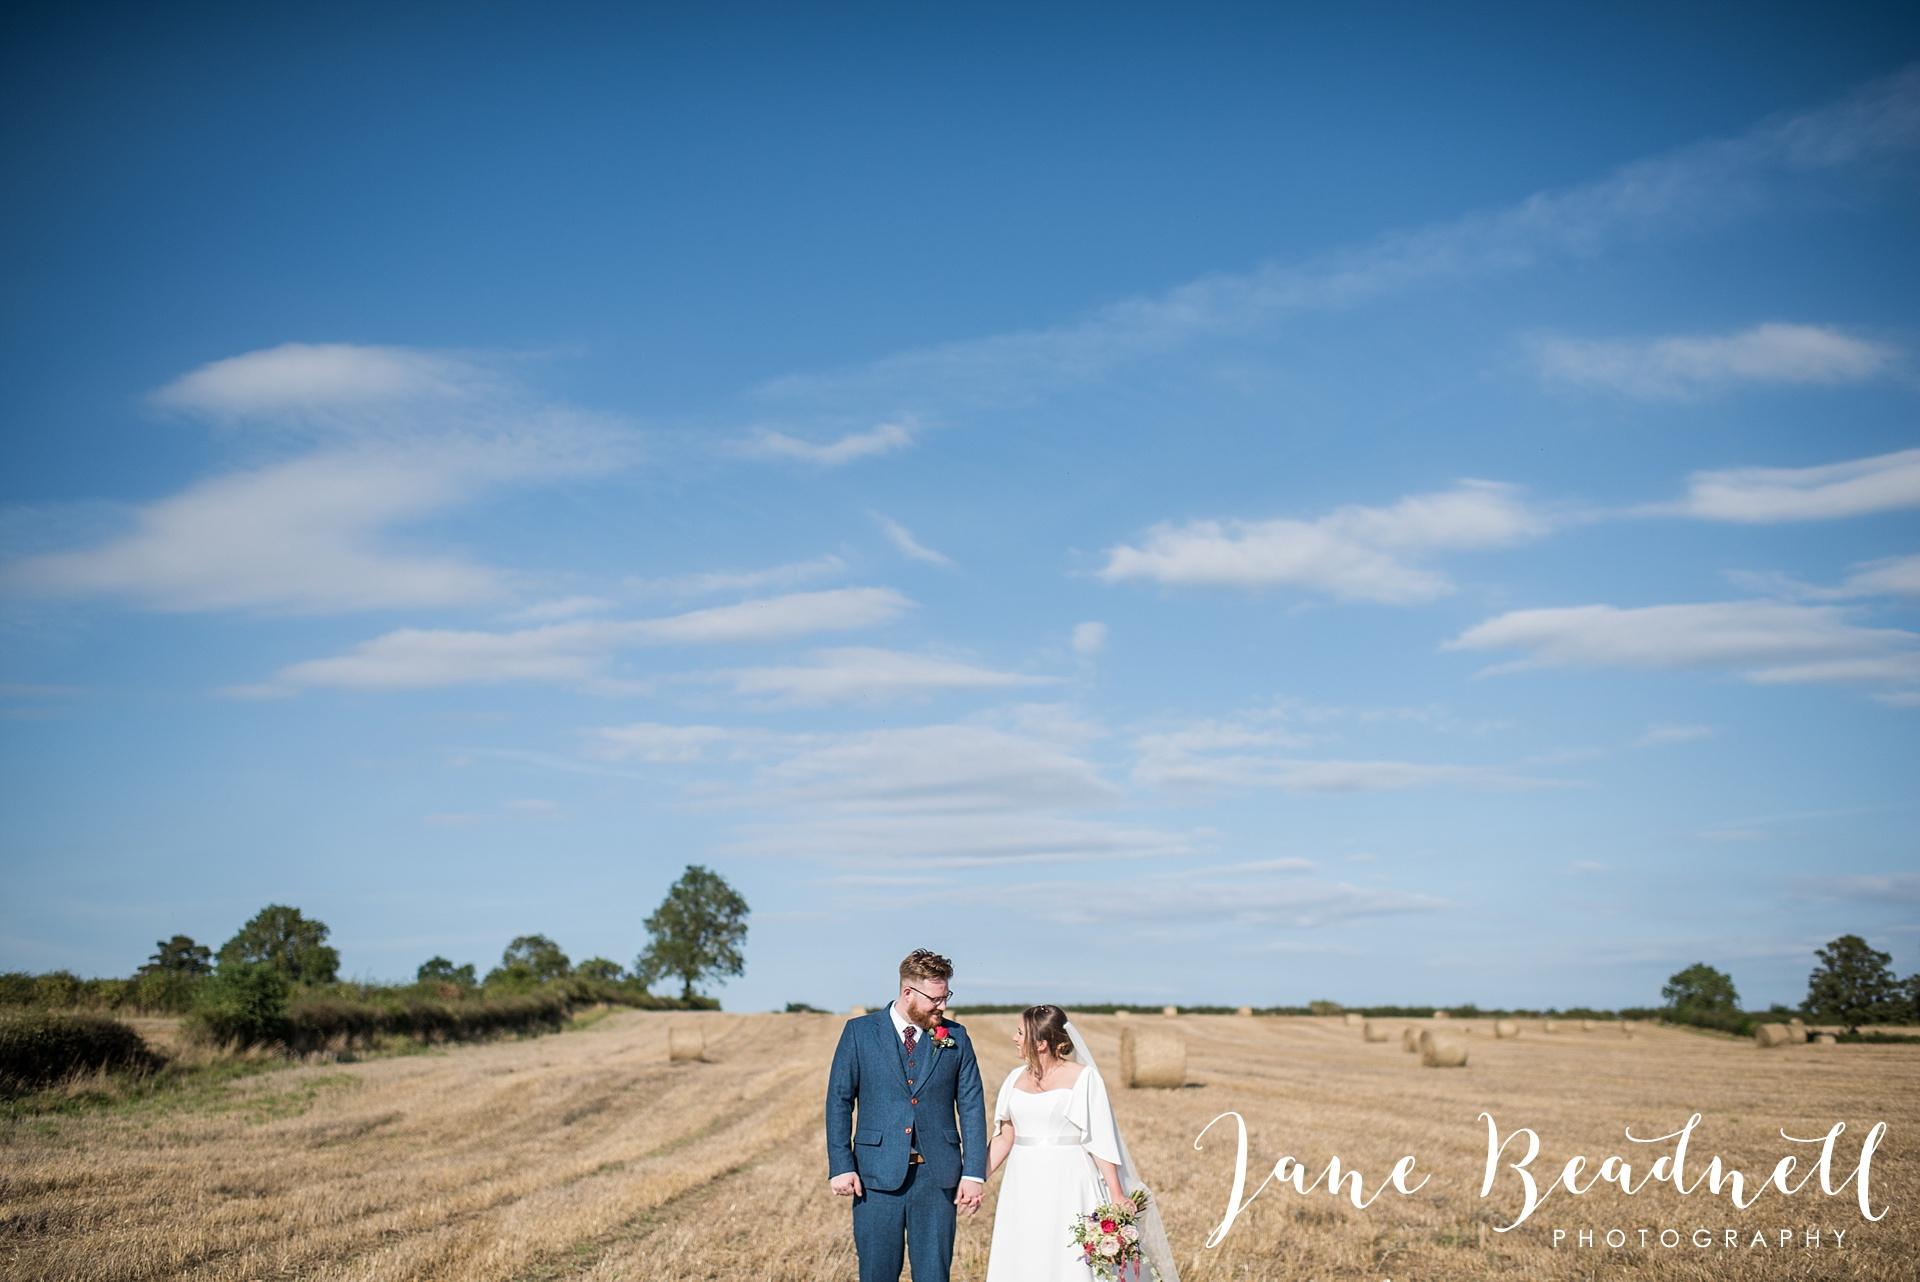 fine-art-wedding-photographer-jane-beadnell-yorkshire-wedding-photographer_0067